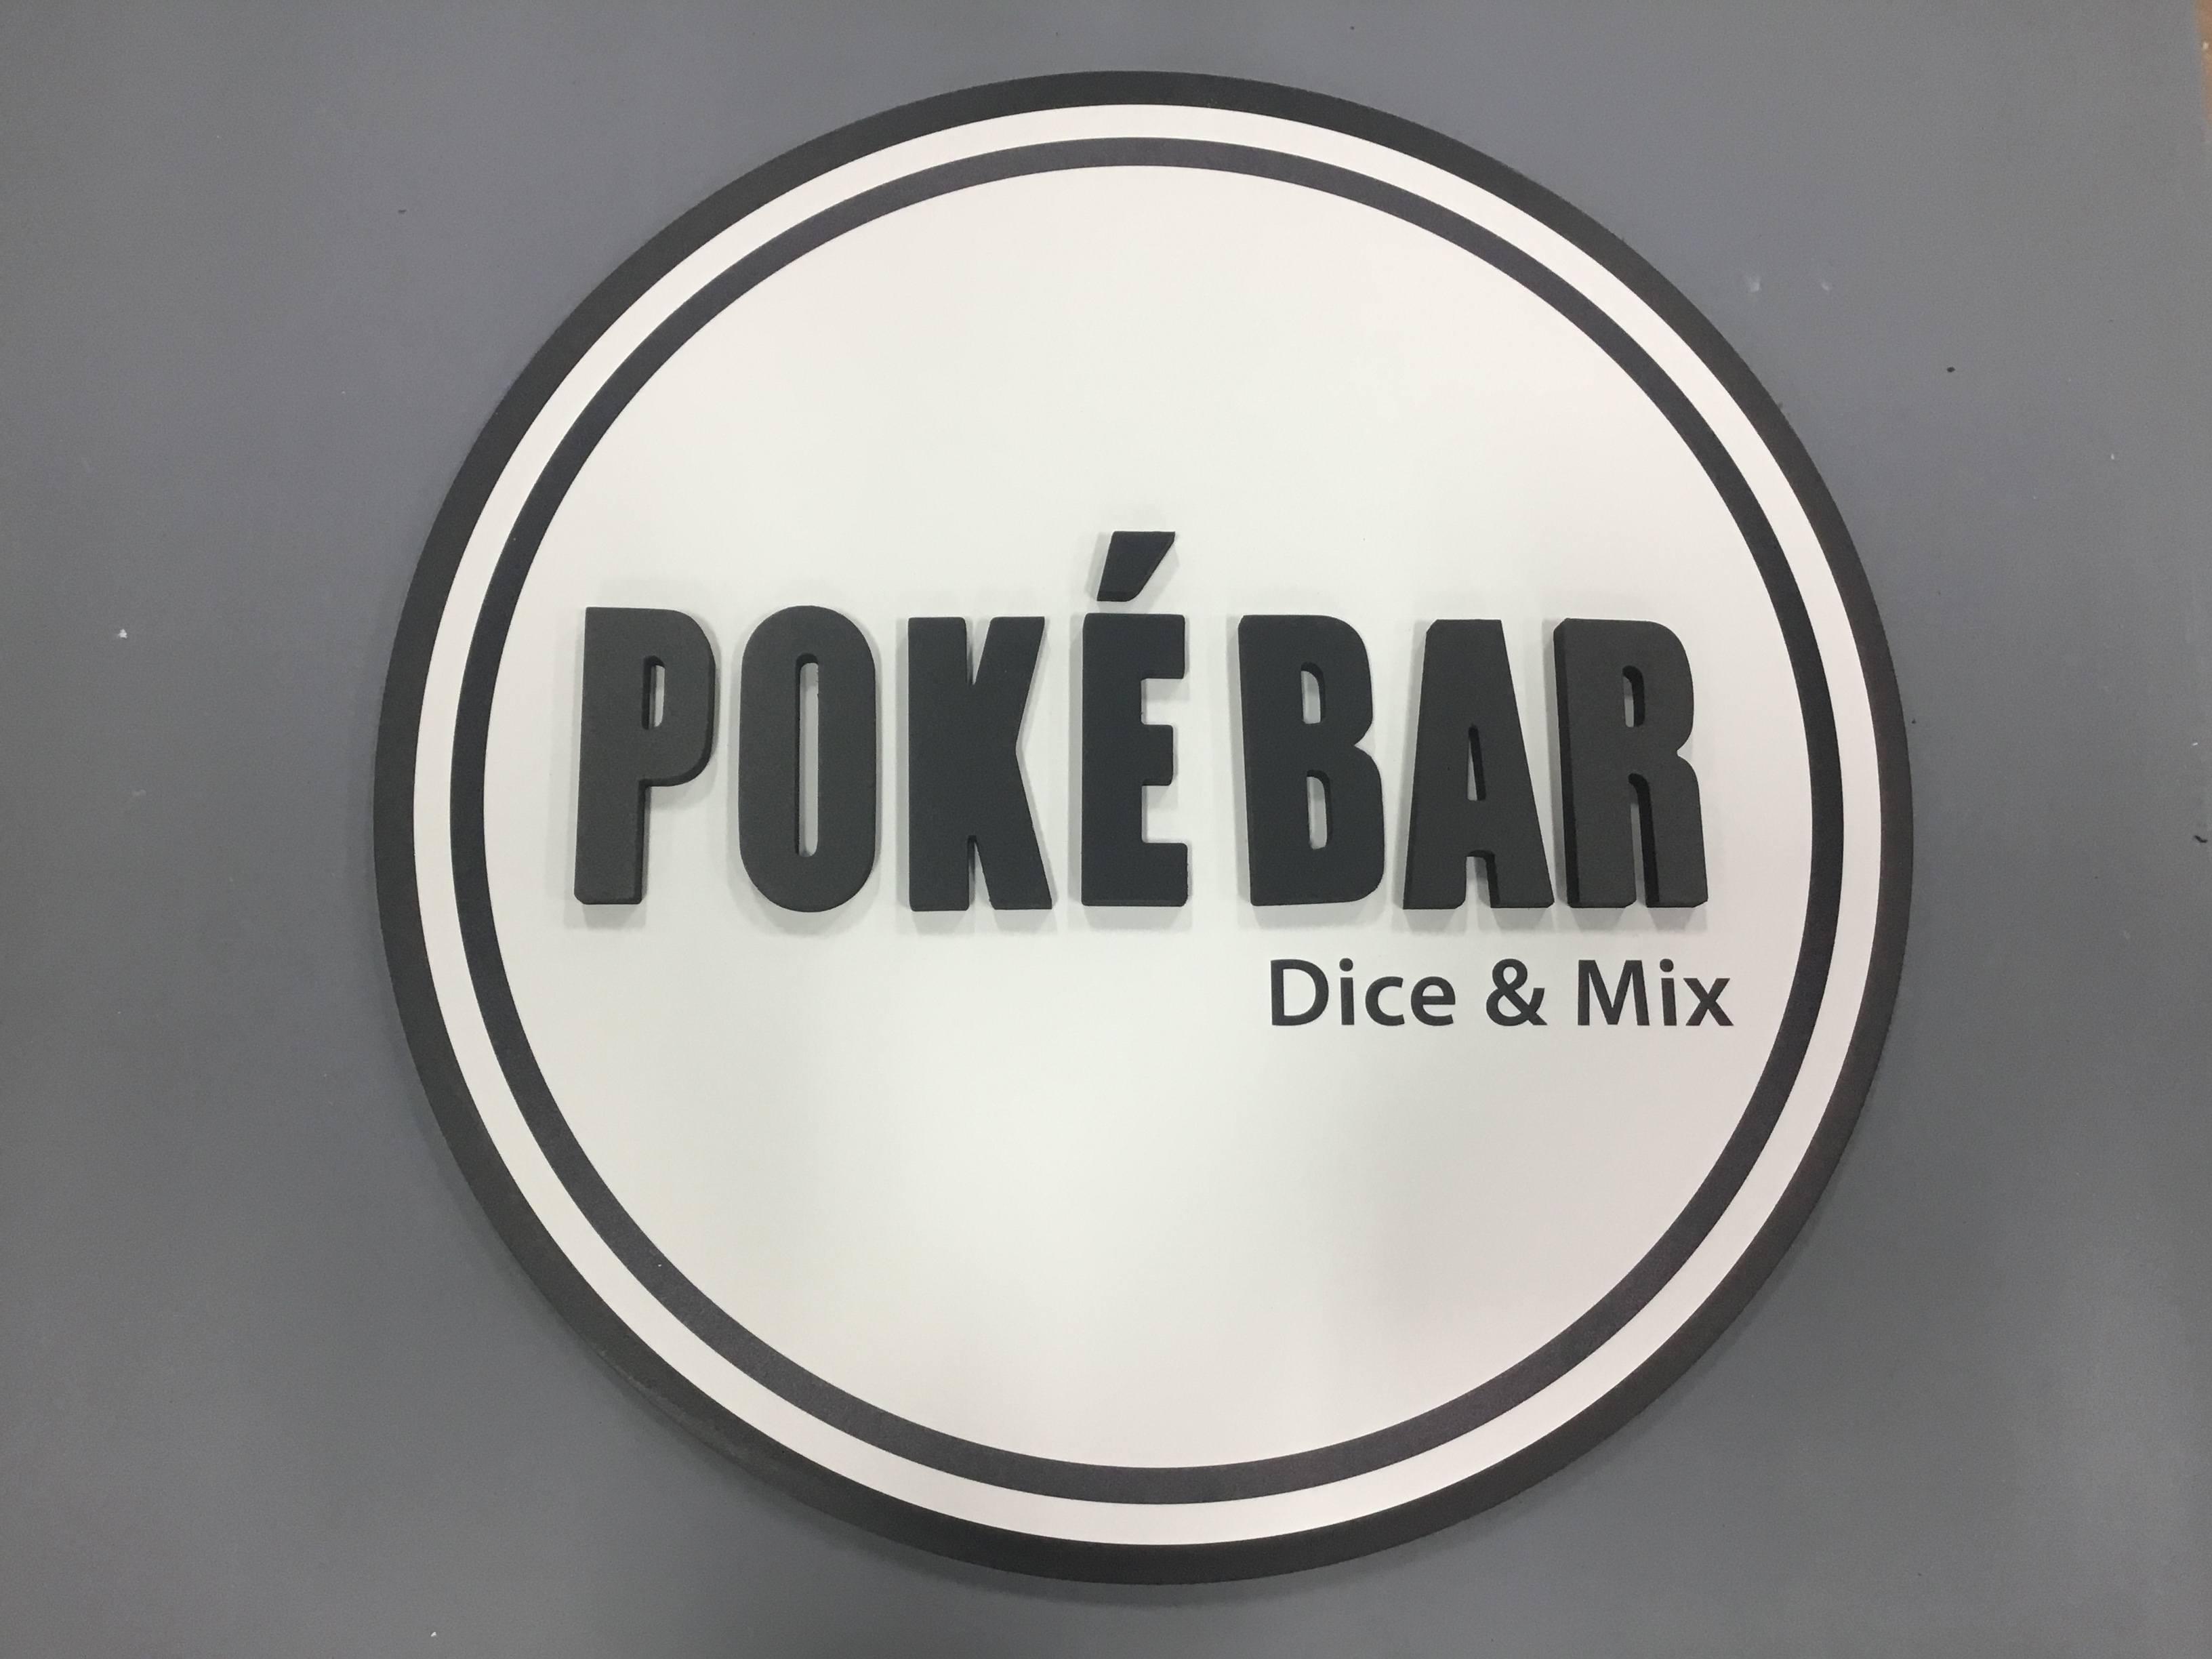 https://heritagecustomsigns.com/blog/wp-content/uploads/Poke-Bar-Sign.jpg